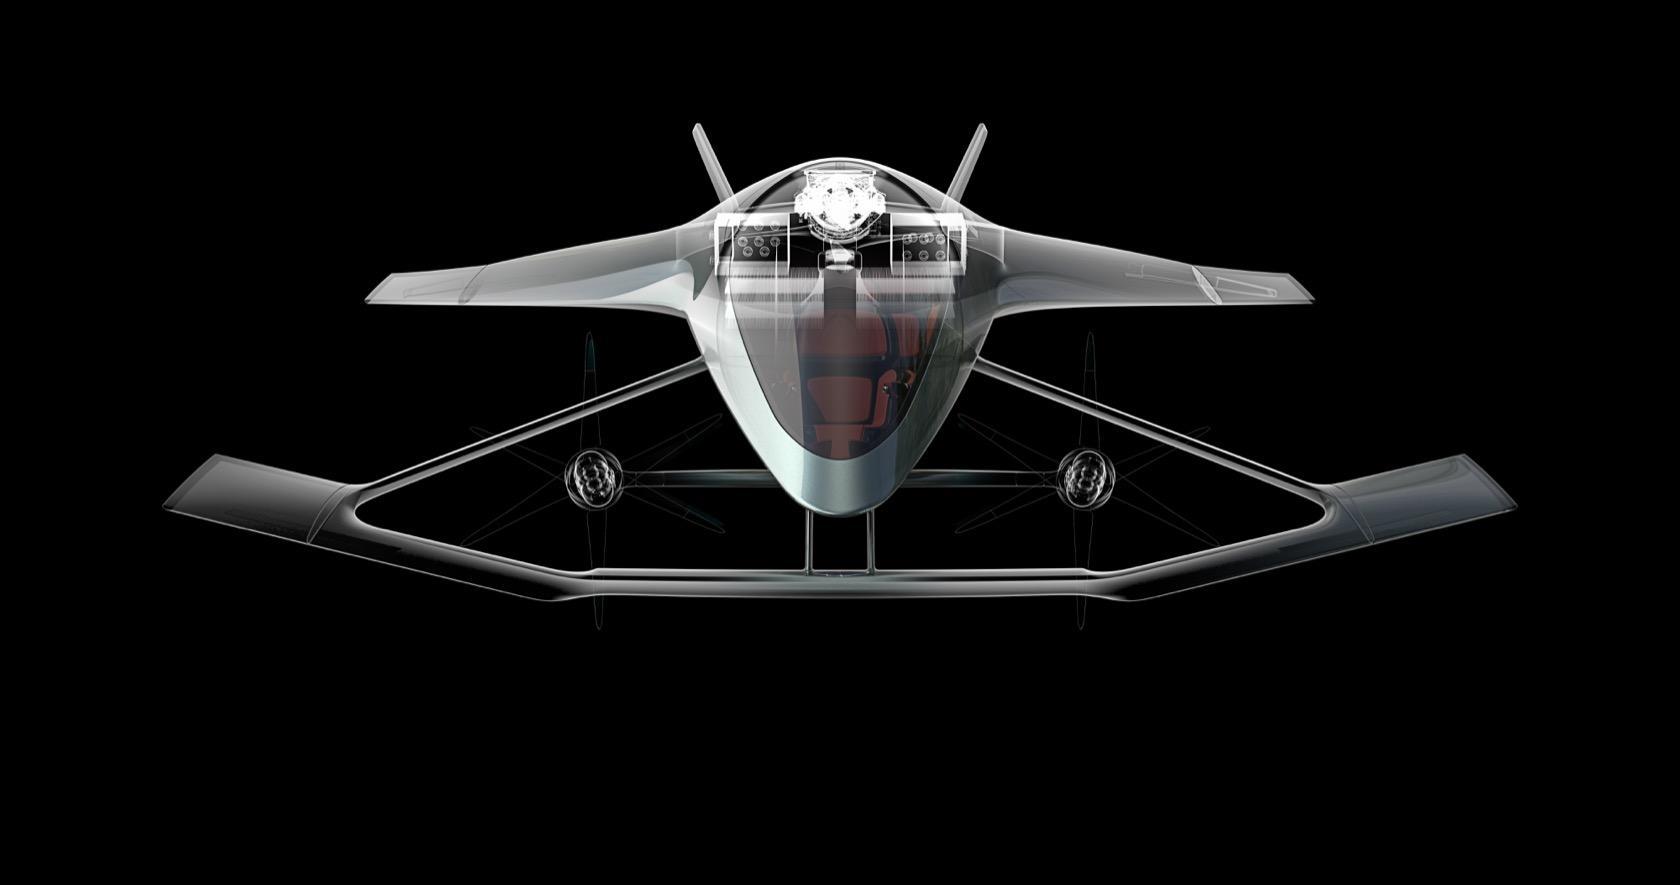 Aston Martin Just Revealed A Self Flying Hybrid Plane Slashgear